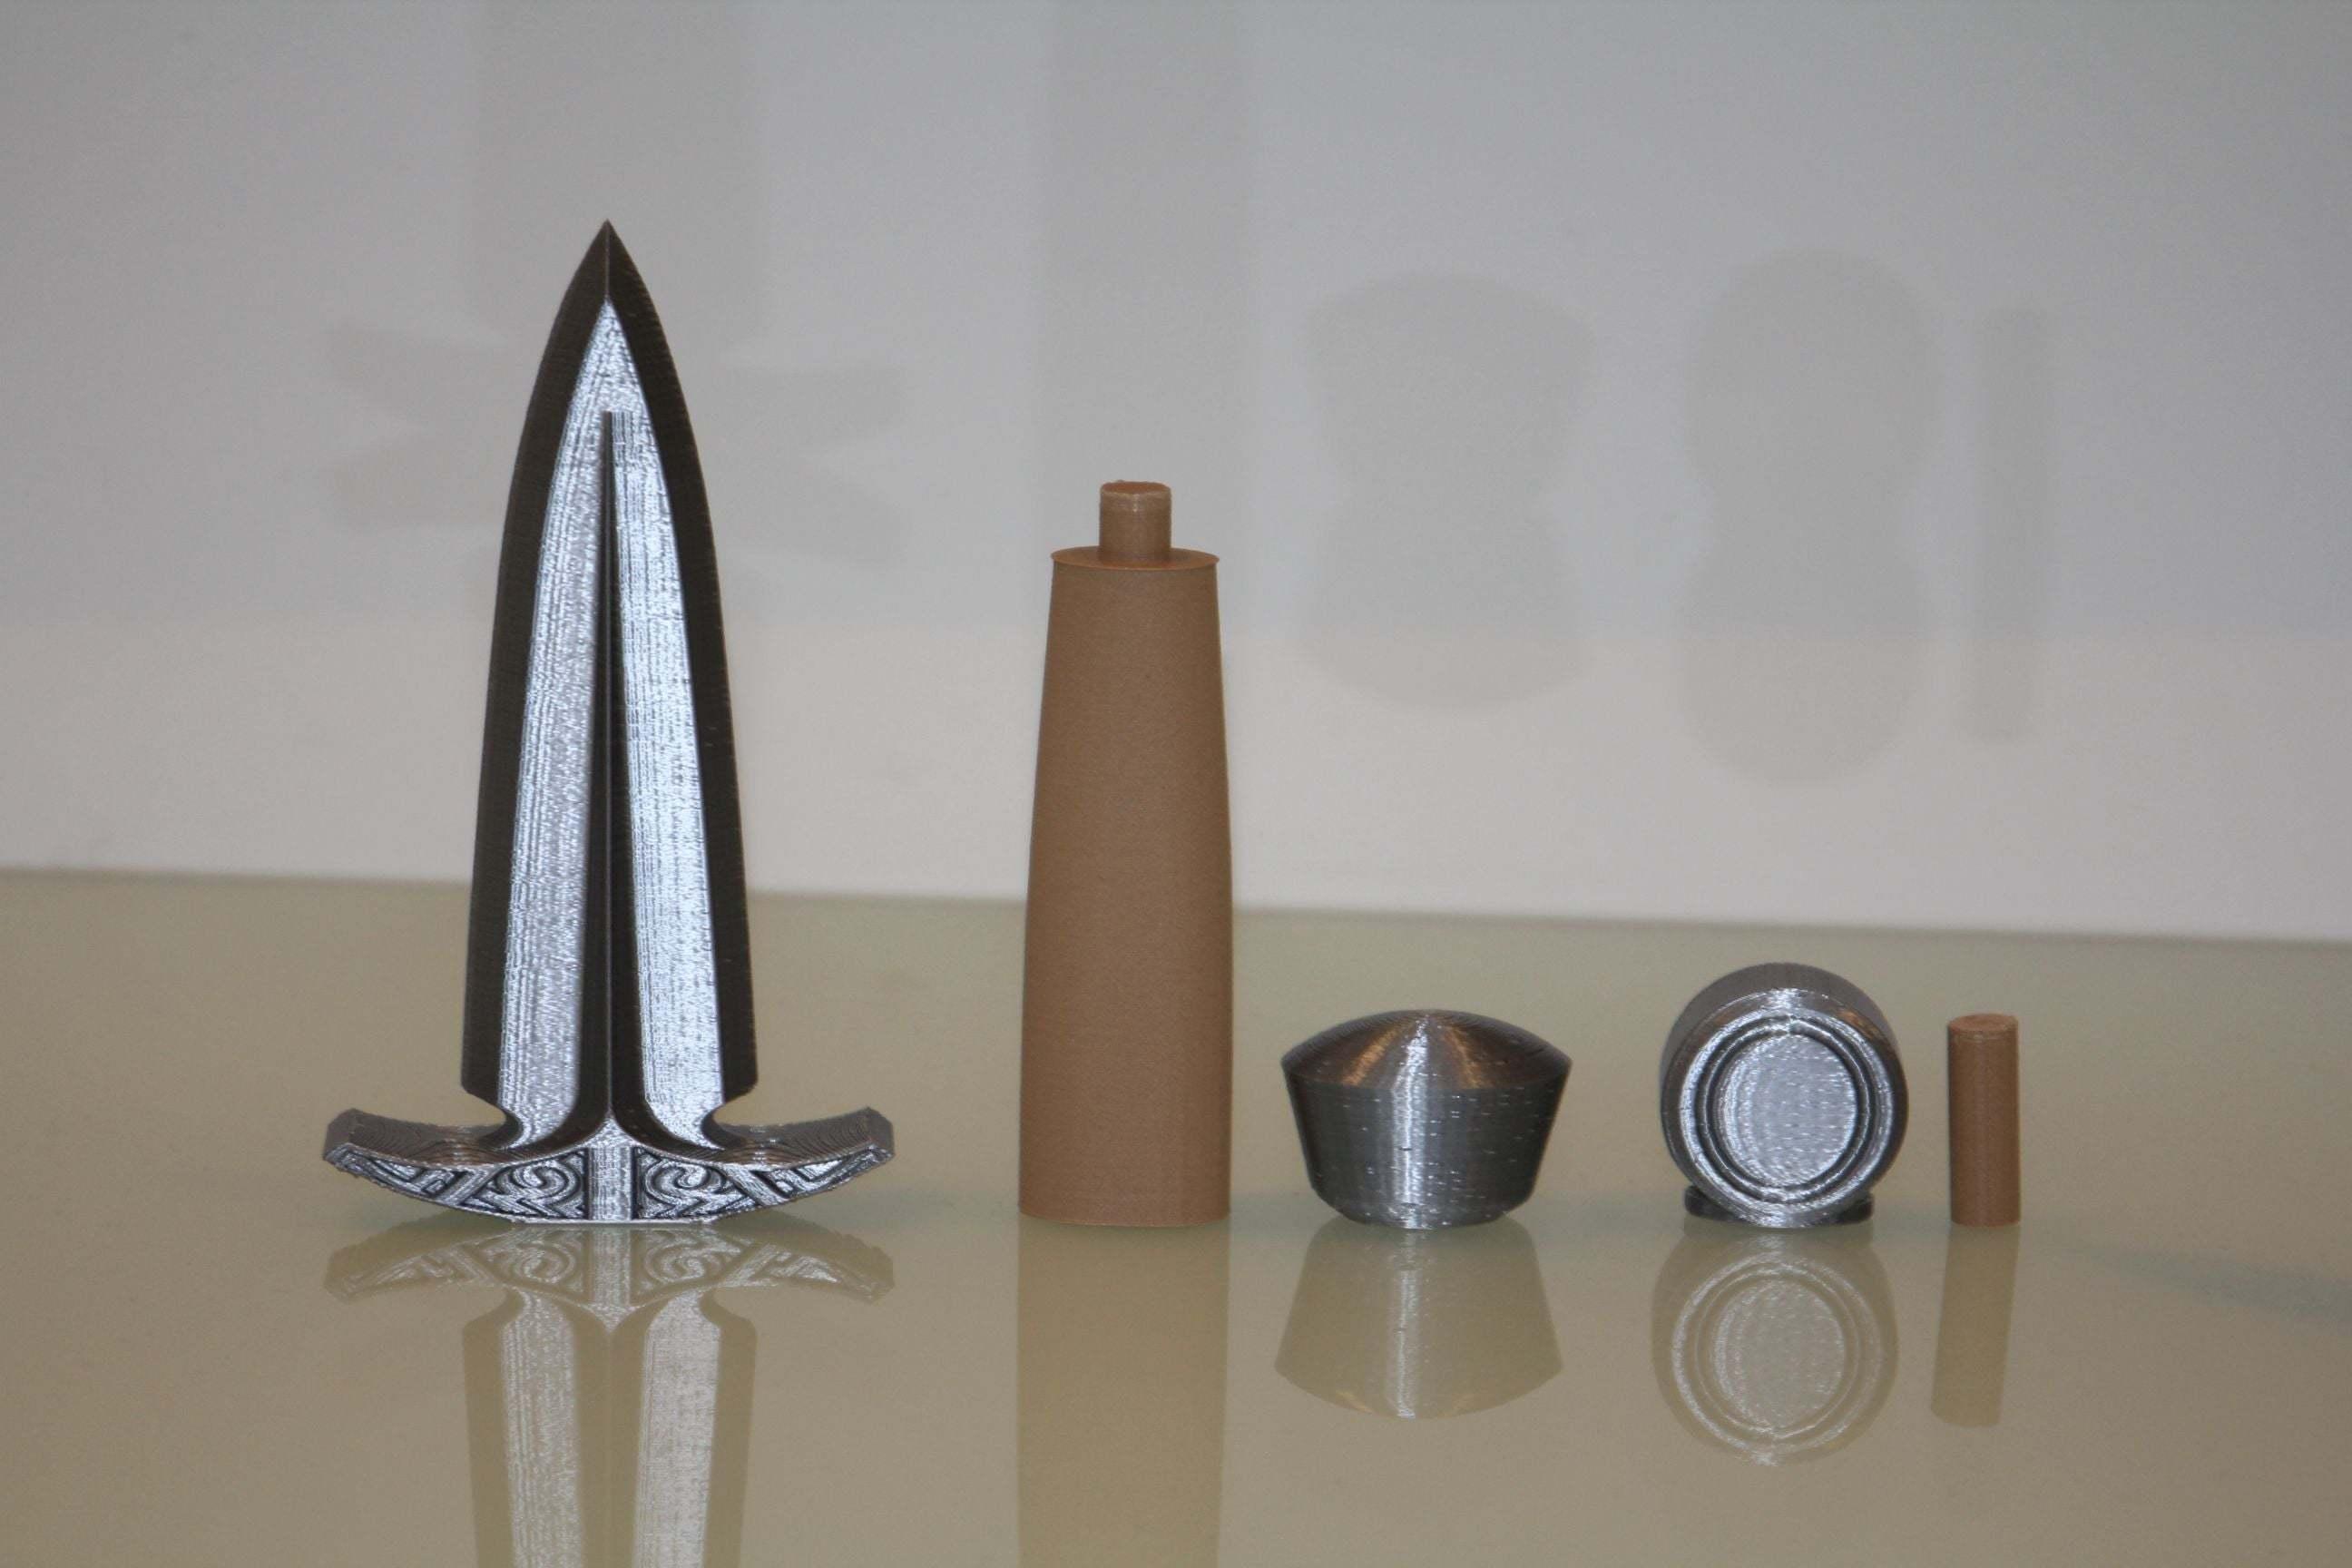 dagger3.jpg Download free STL file Dagger - easy to print, no support • 3D printable model, plokr